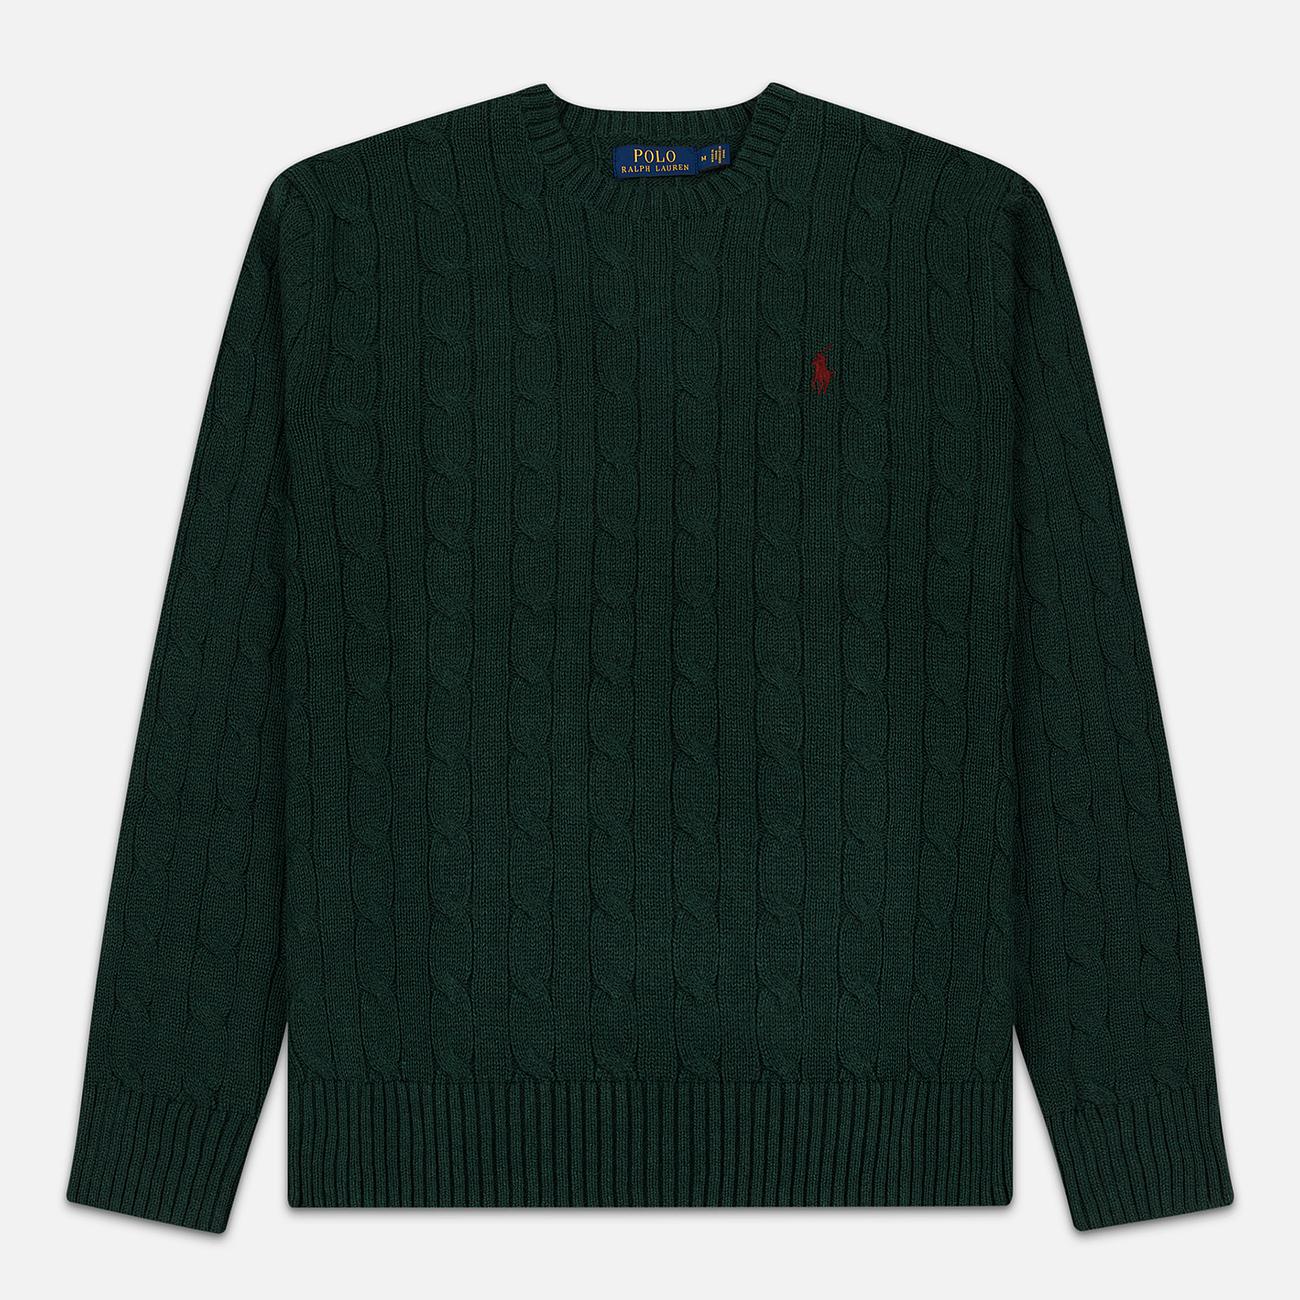 Мужской свитер Polo Ralph Lauren Crew Neck Cable Knit Scotch Pine Heather